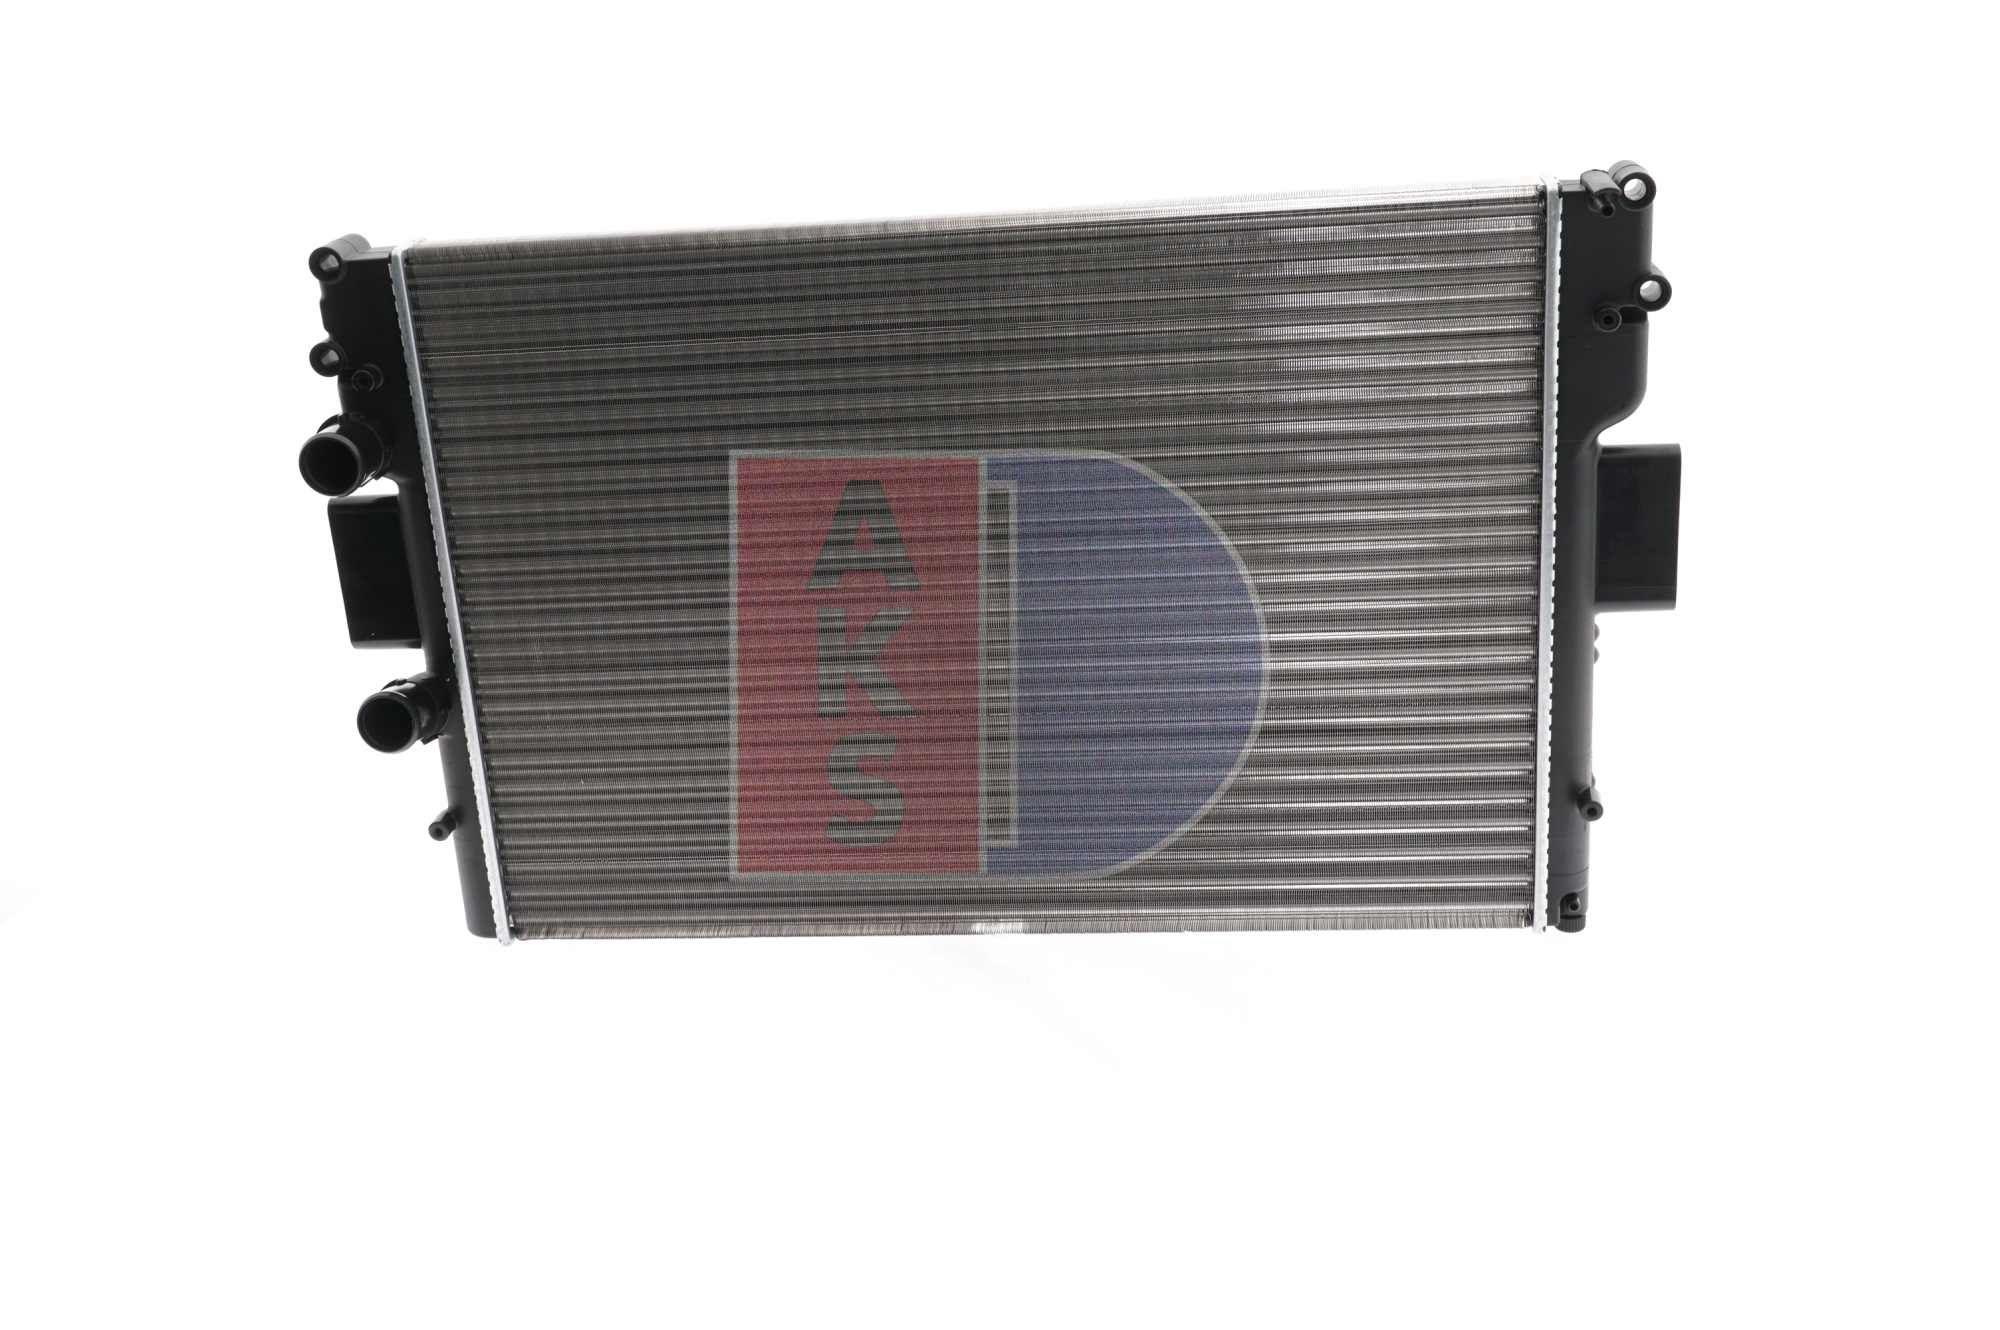 400037N Wasserkühler AKS DASIS 400037N - Große Auswahl - stark reduziert